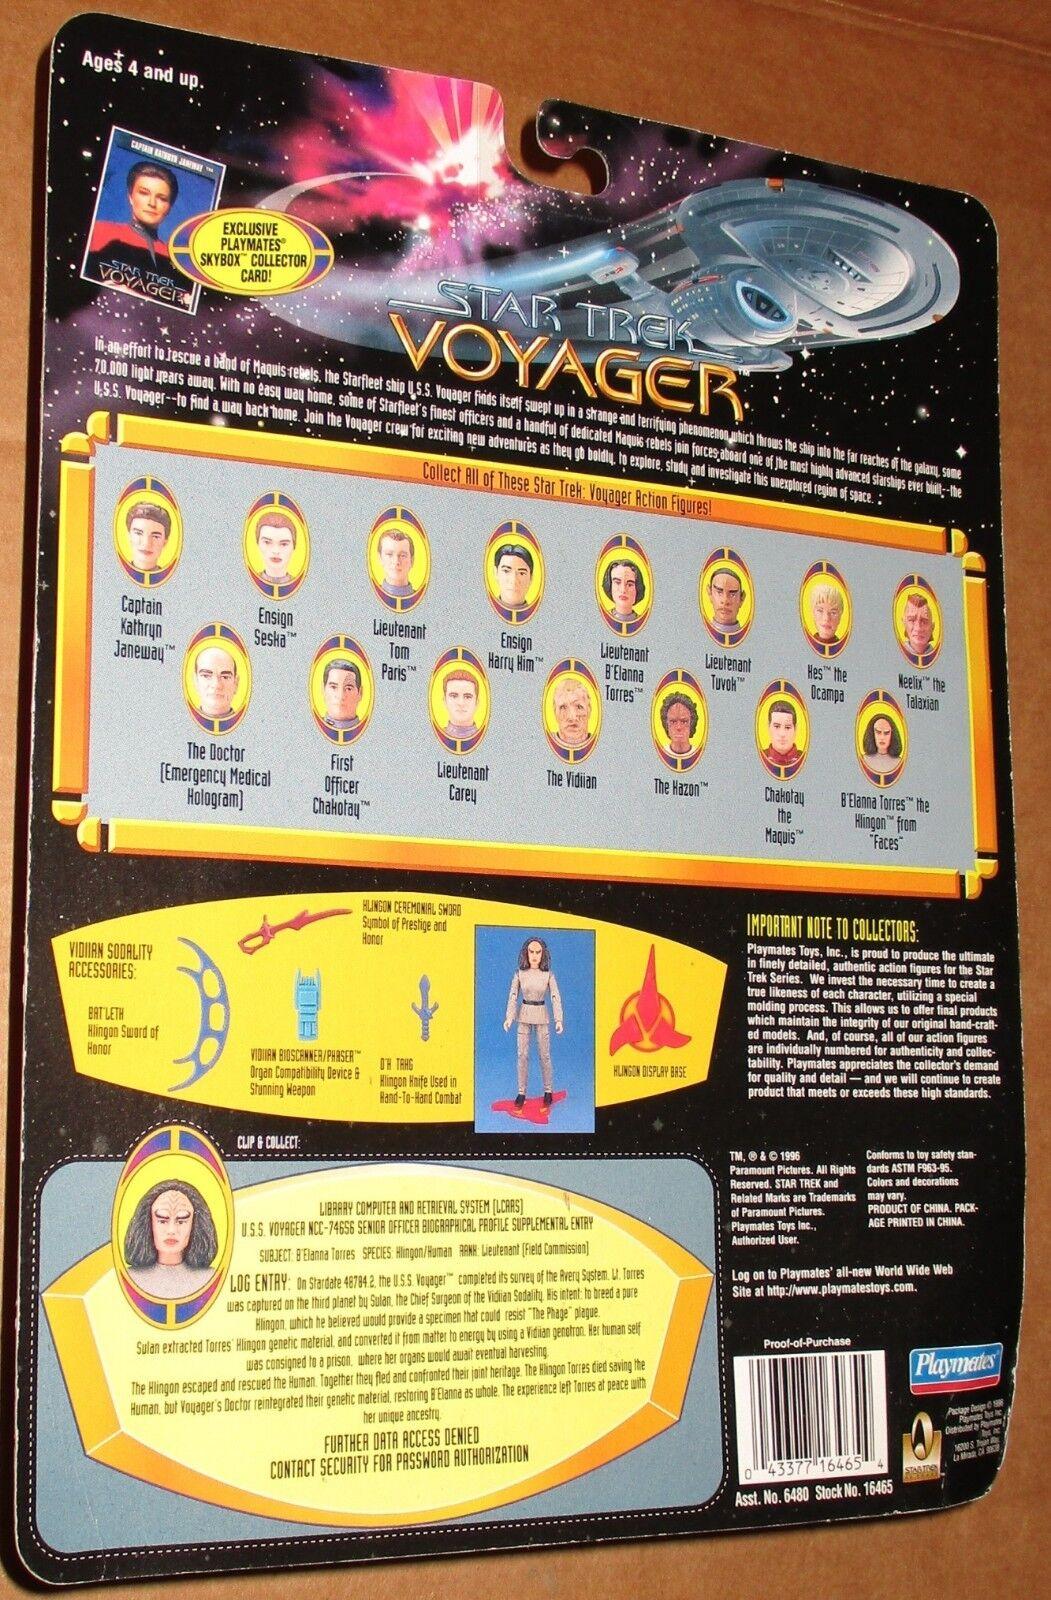 000002 Star Trek B'Elanna Voyager Niedrig Number B'Elanna Trek Torres Klingon MOC 1996 Playmates 70e505